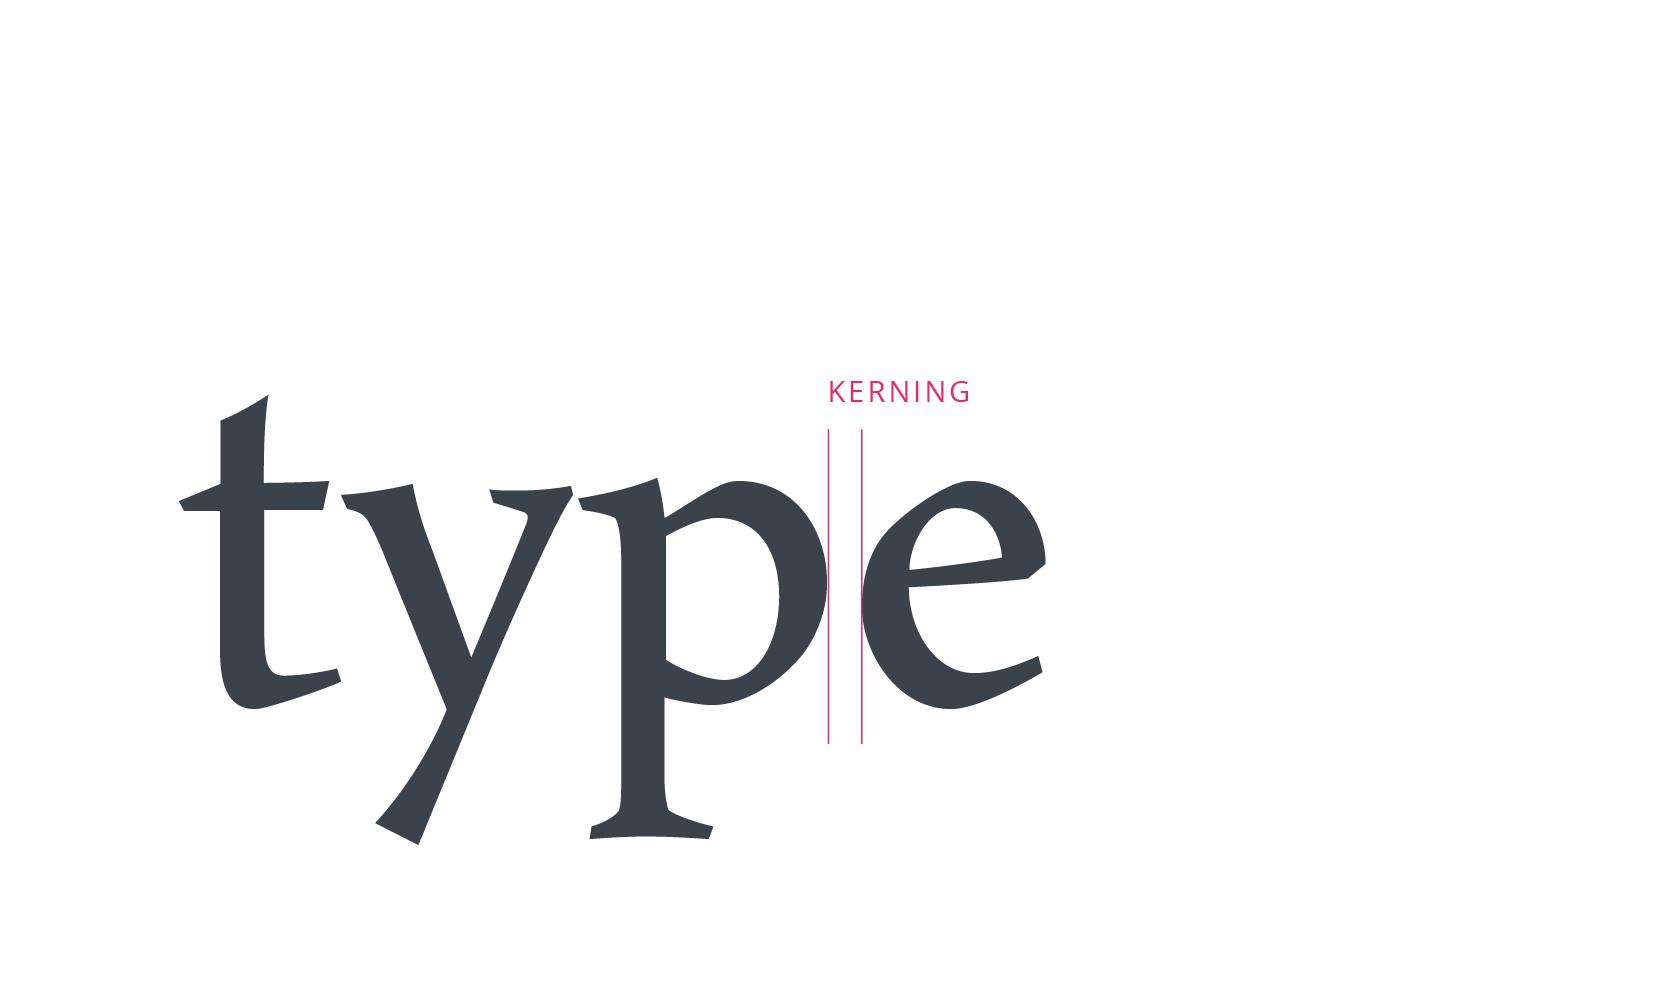 tubik_typography_kerning